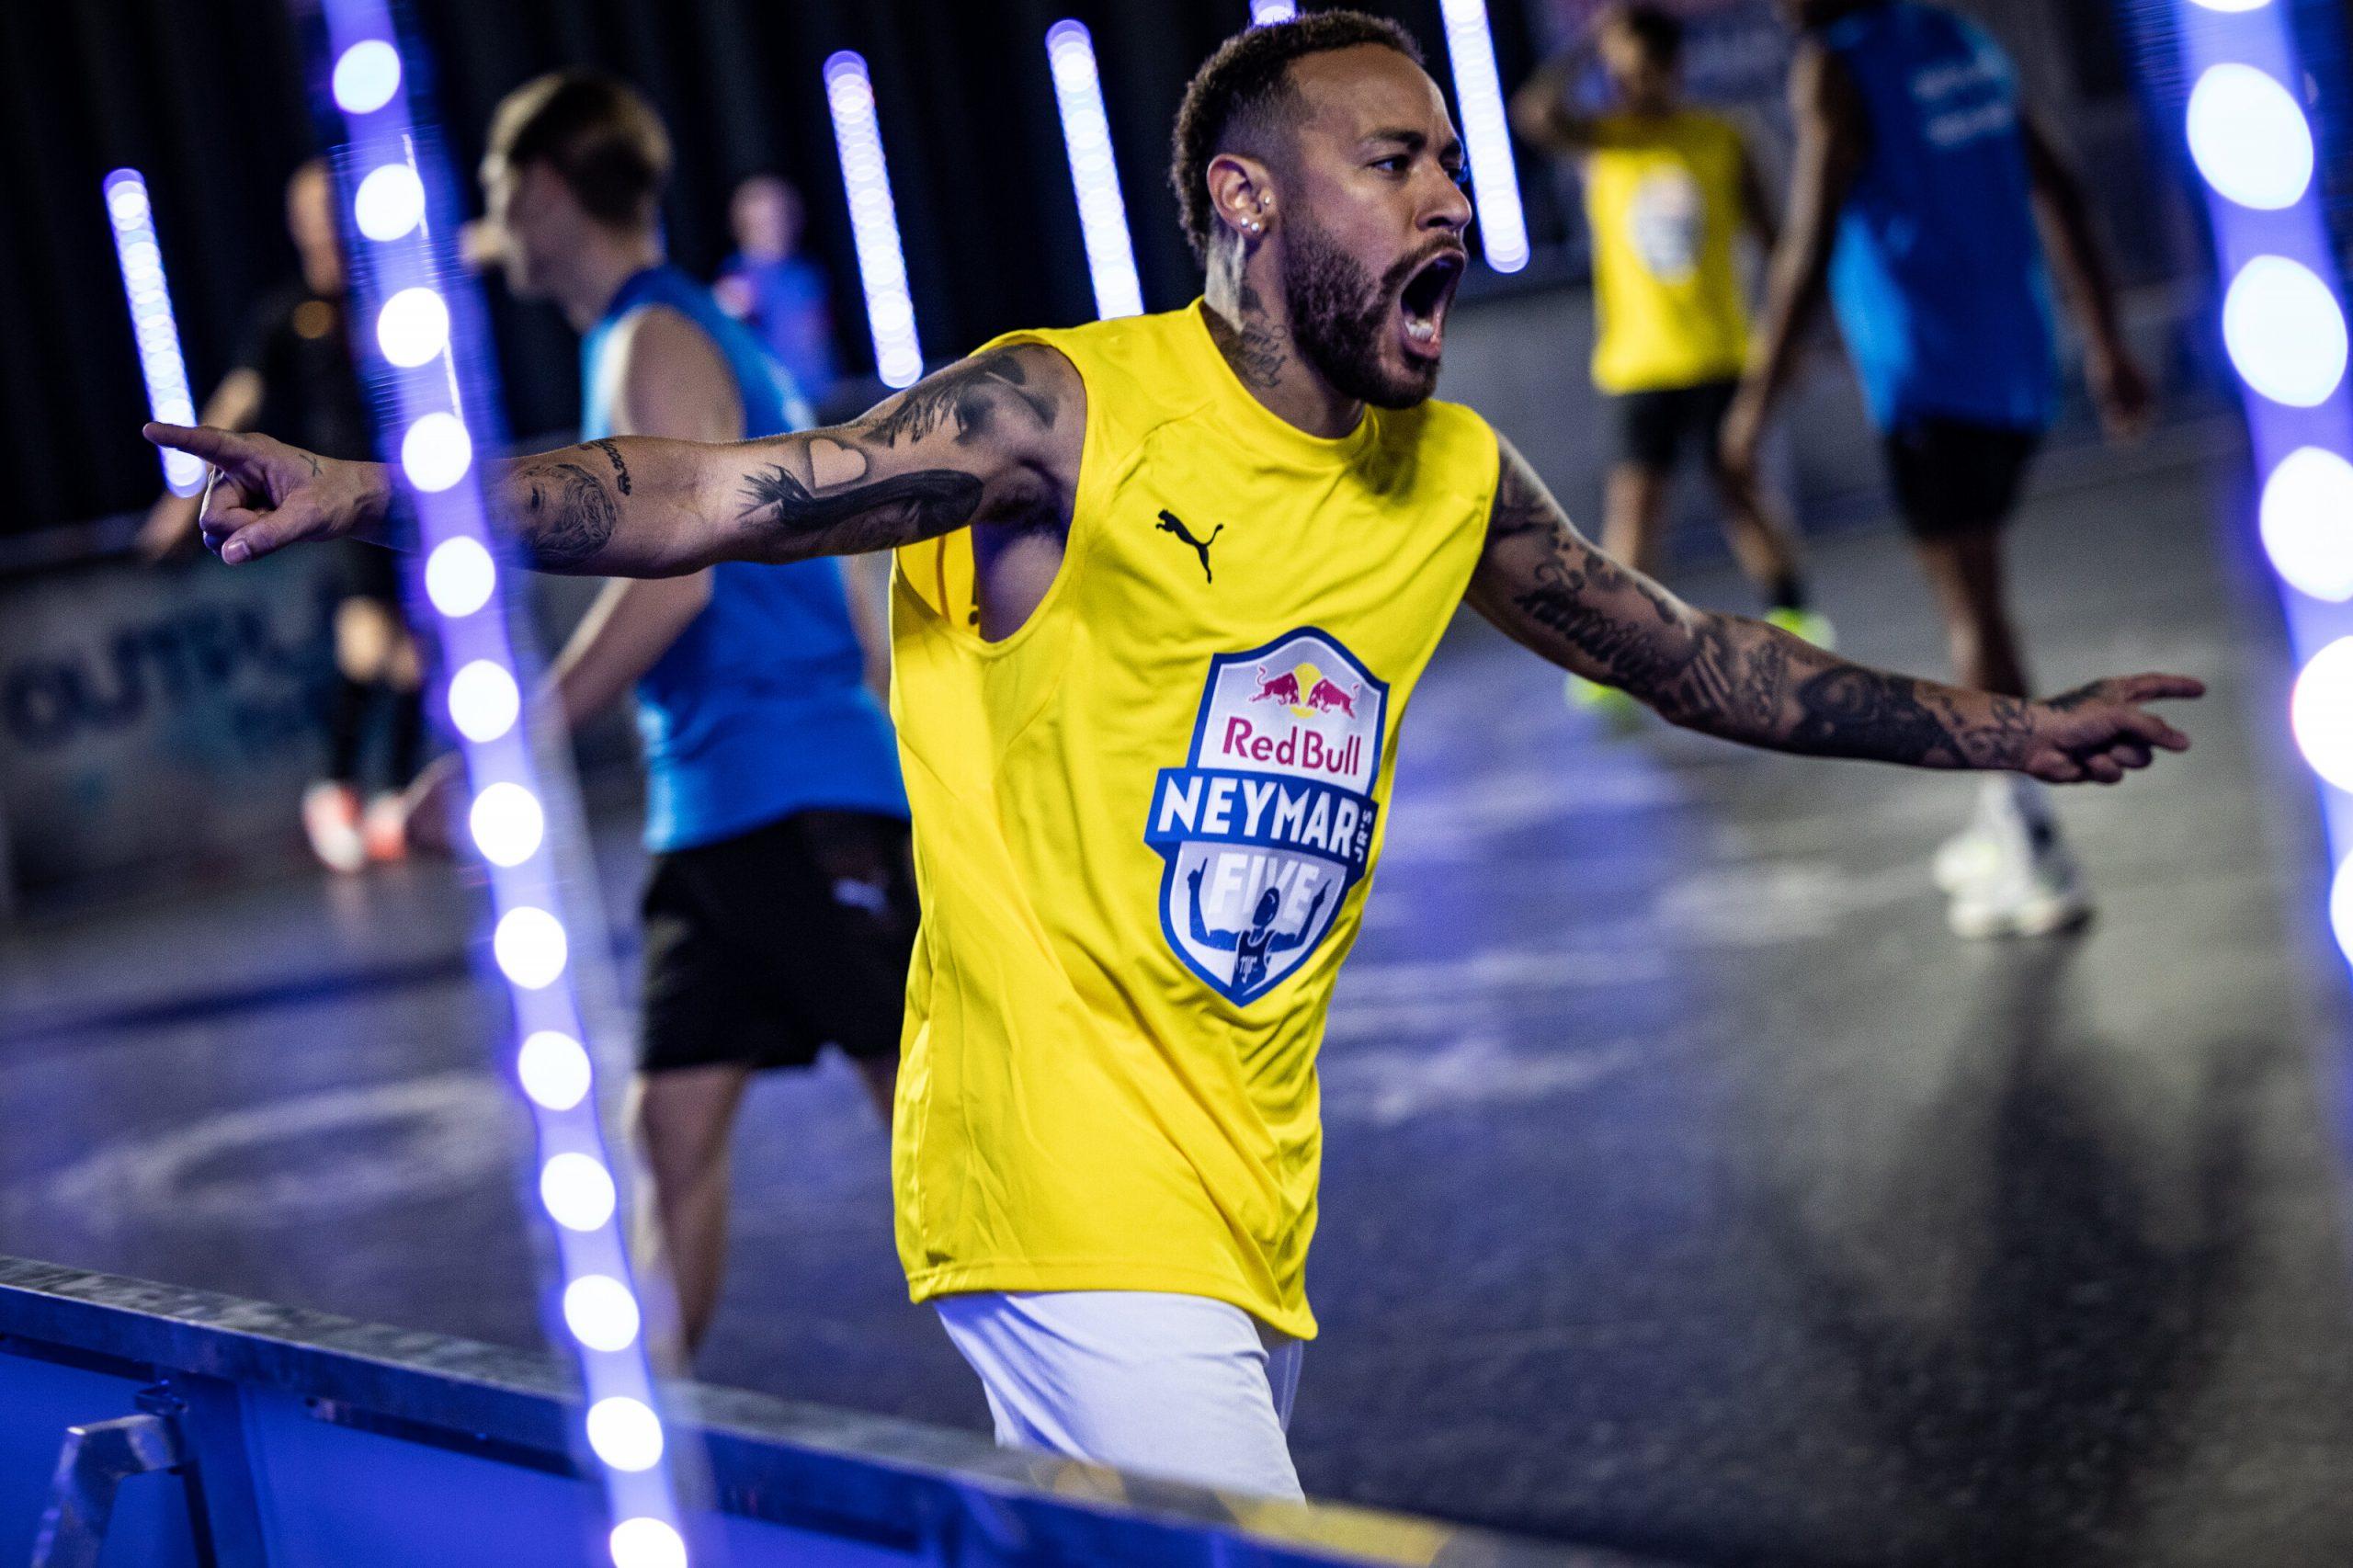 Neymar Jr seen during Neymar Jr's Five Event in Salzburg, Austria on January 23, 2021 // SI202105170021